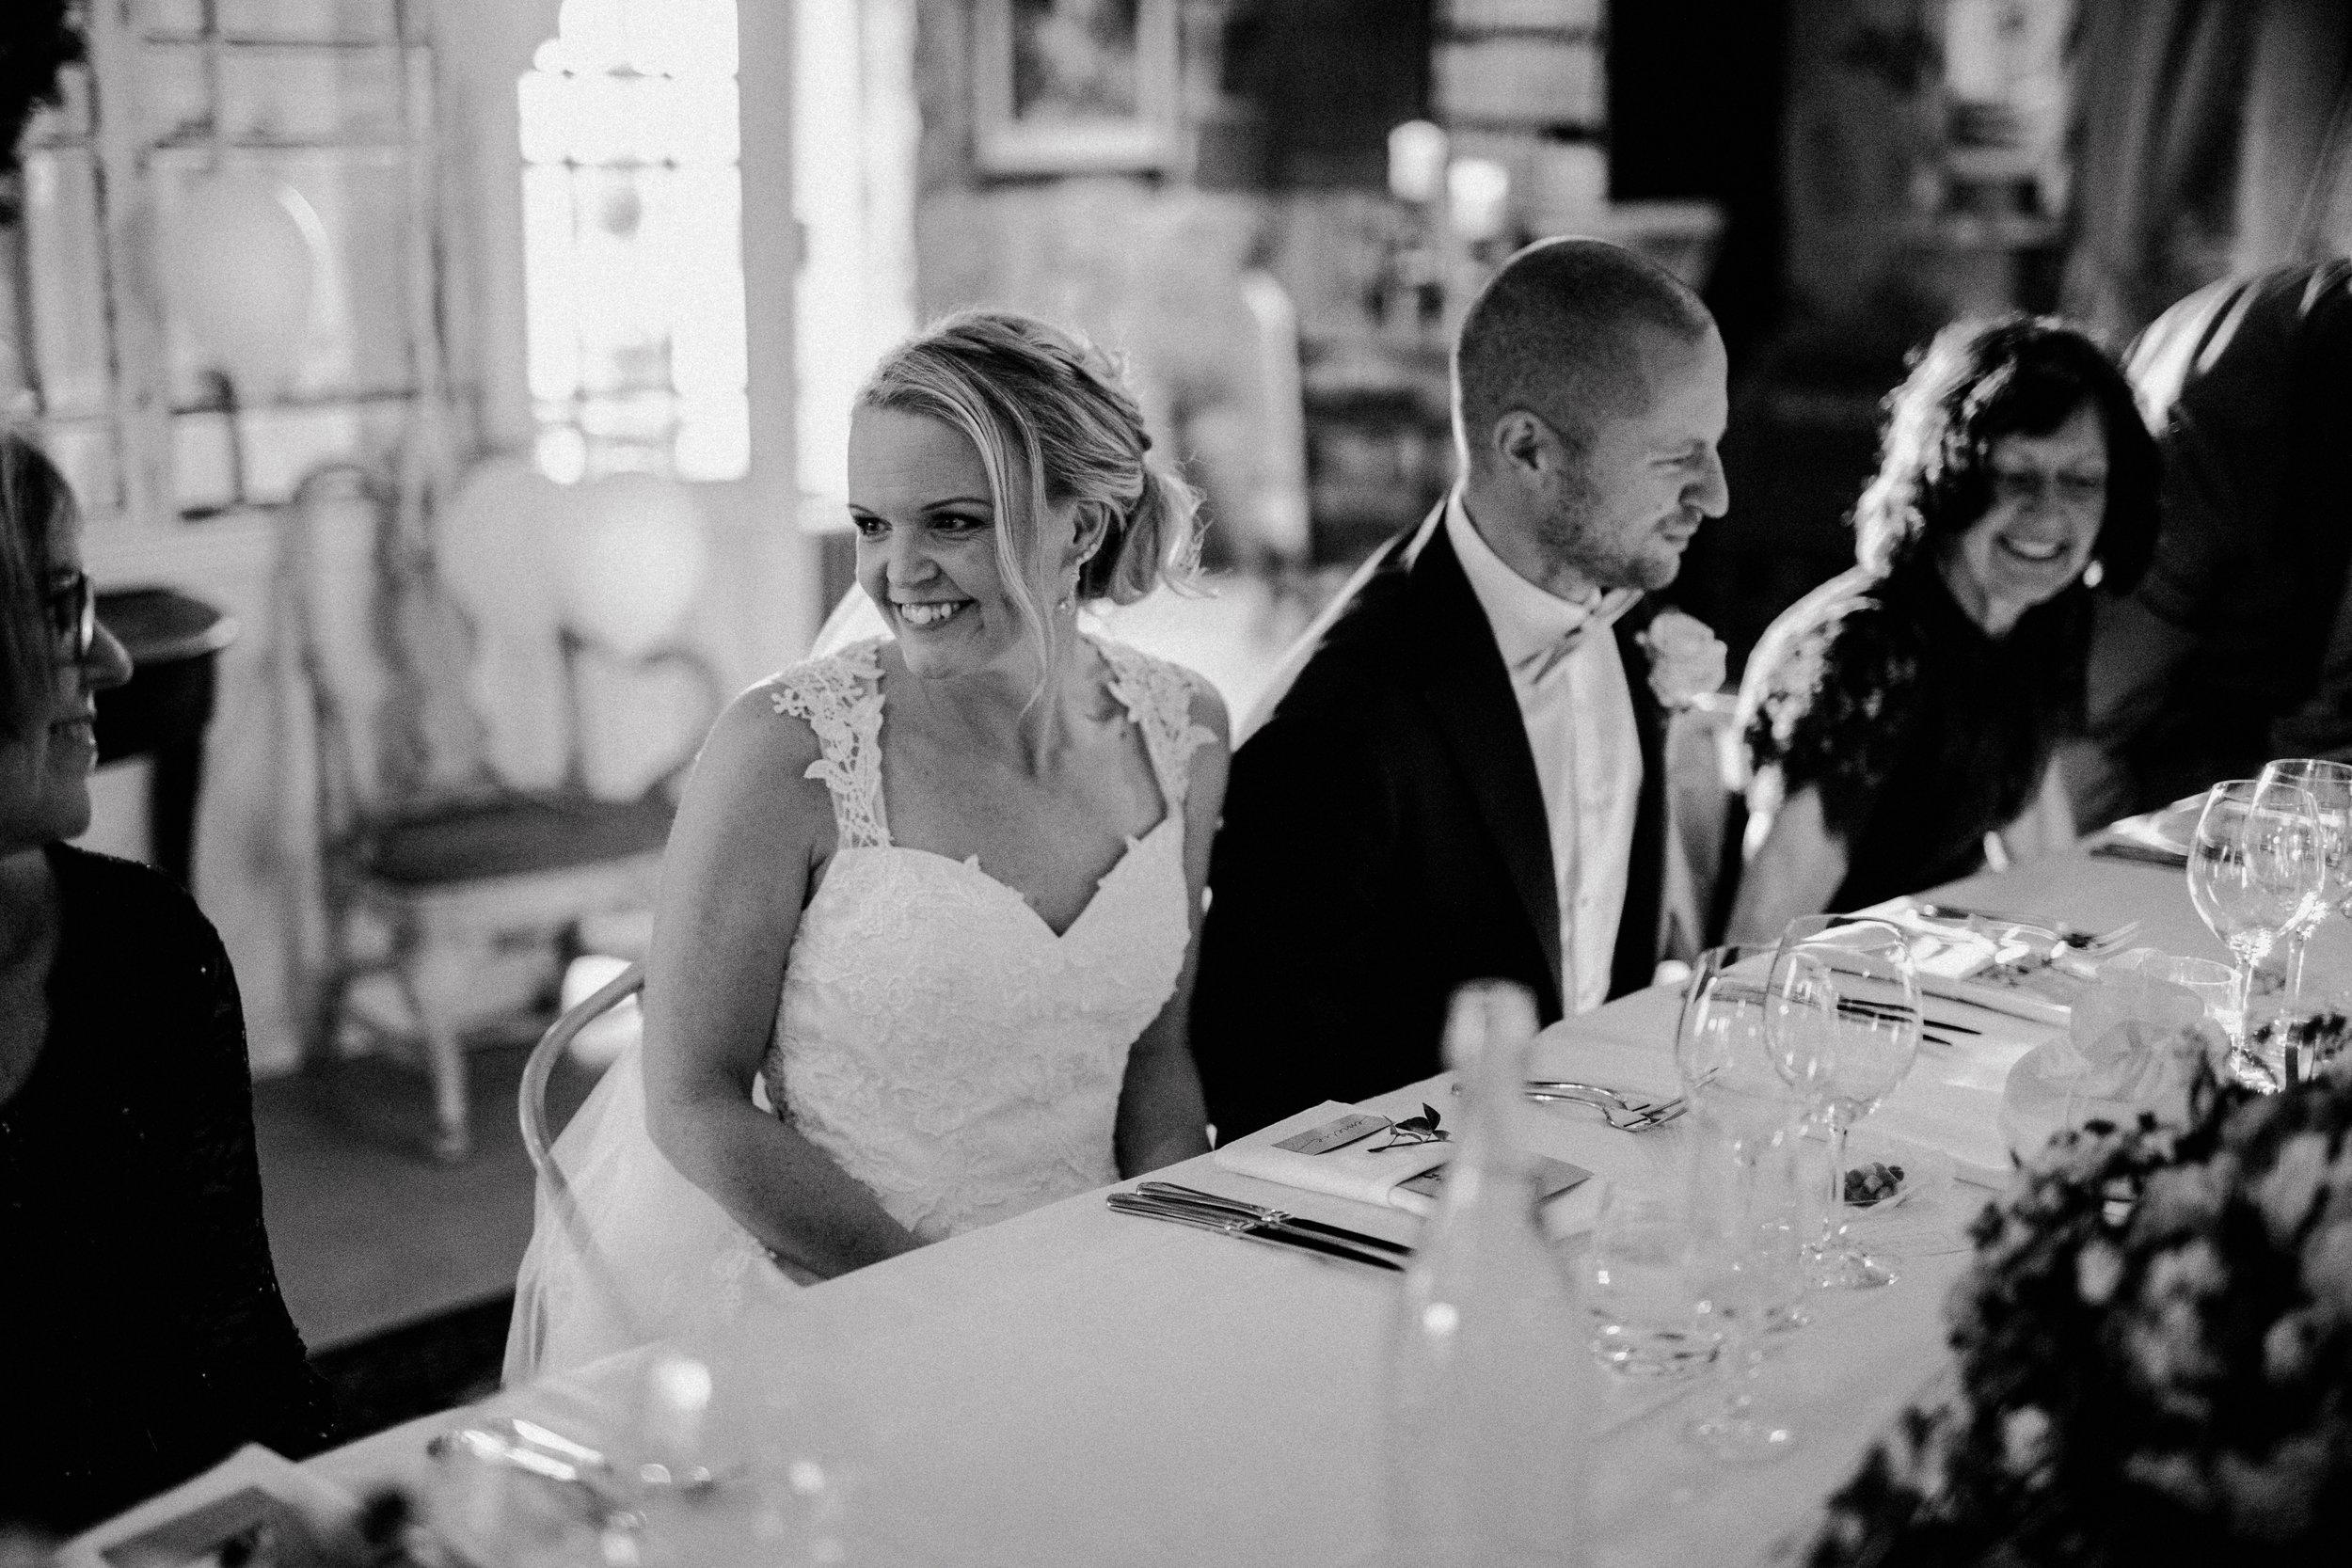 Bröllopsfotograf-Uddetorp Säteri-Höstbröllop-Fotograf Emilia- Bröllopsfotograf Borås-53.jpg